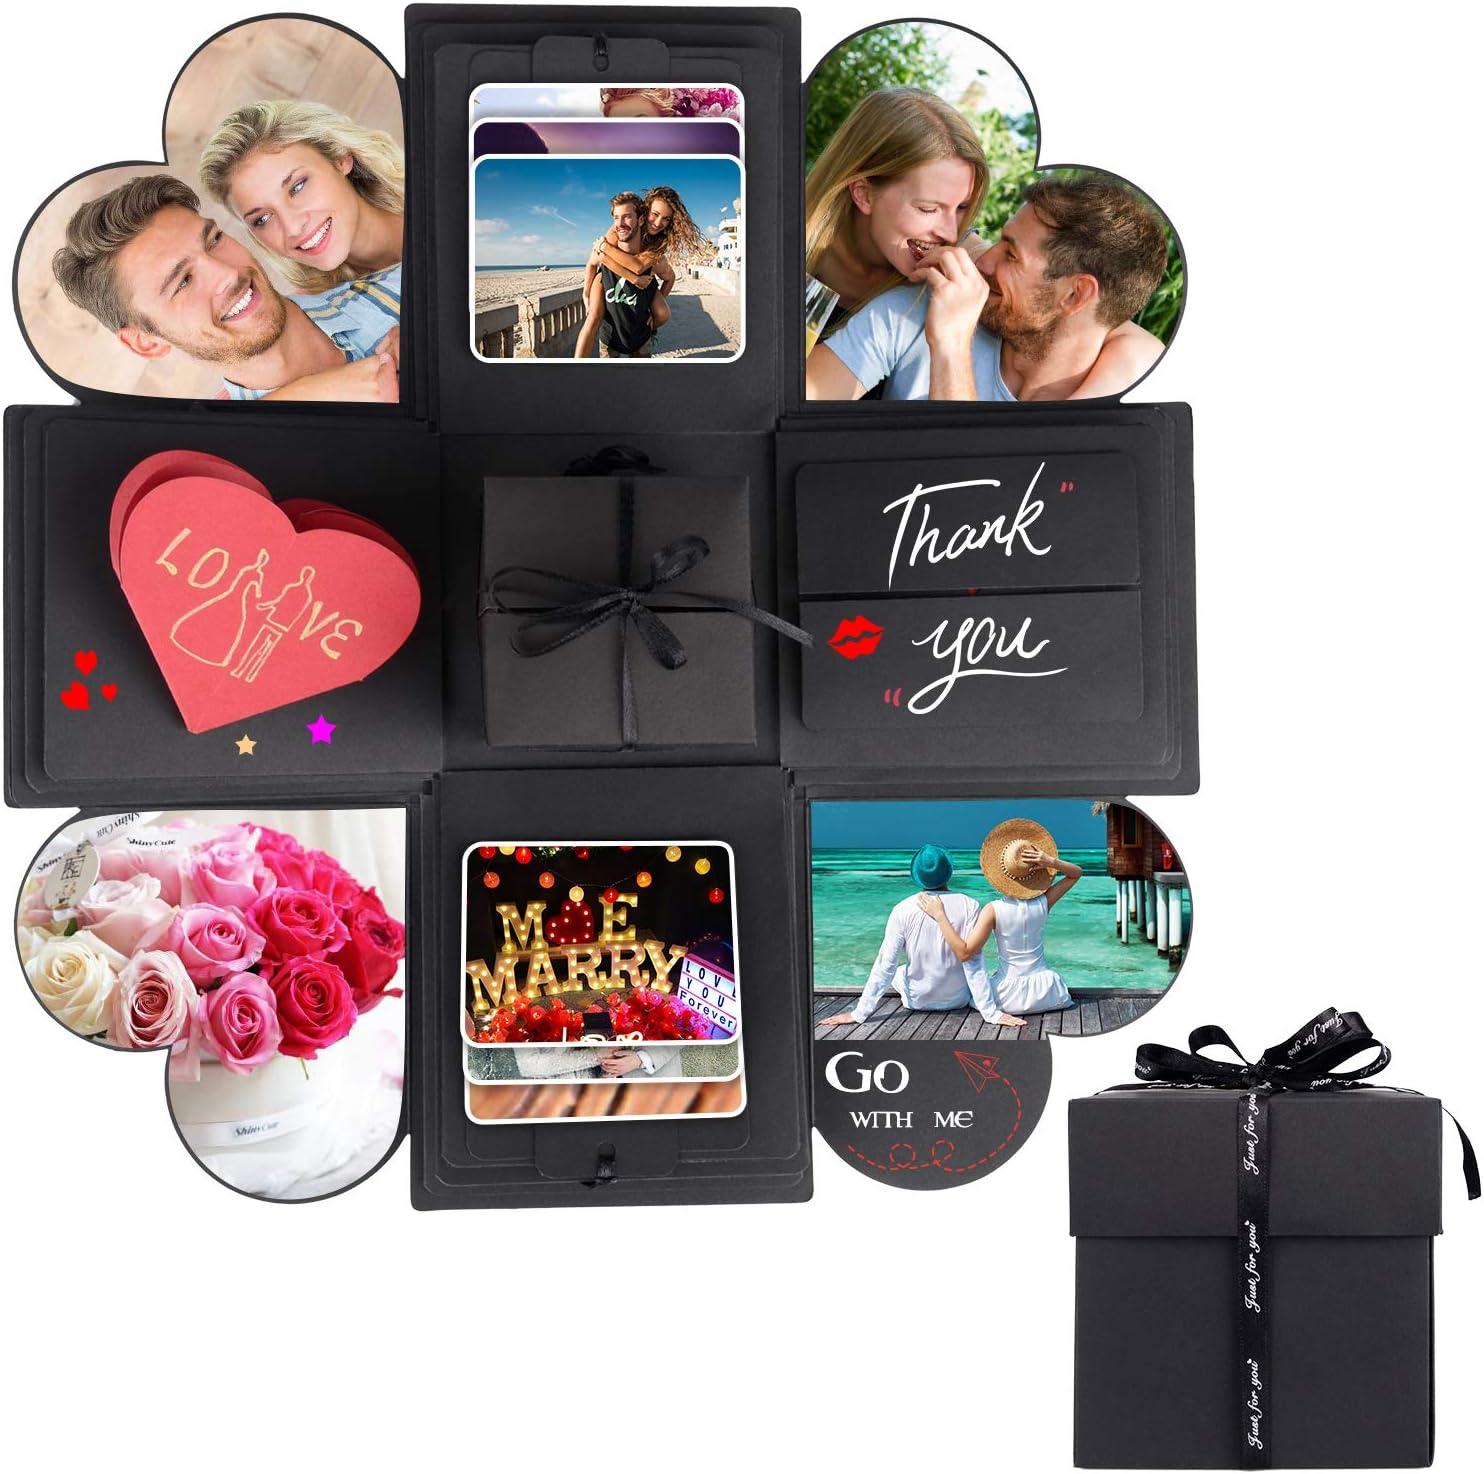 Abvenc Pop Up Explosion Box DIY Handmade Gift Box Photo Album Scrapbook Scrap Book Birthday Wedding Valentines Day Christmas Surprise Present Creative Birthday Gift